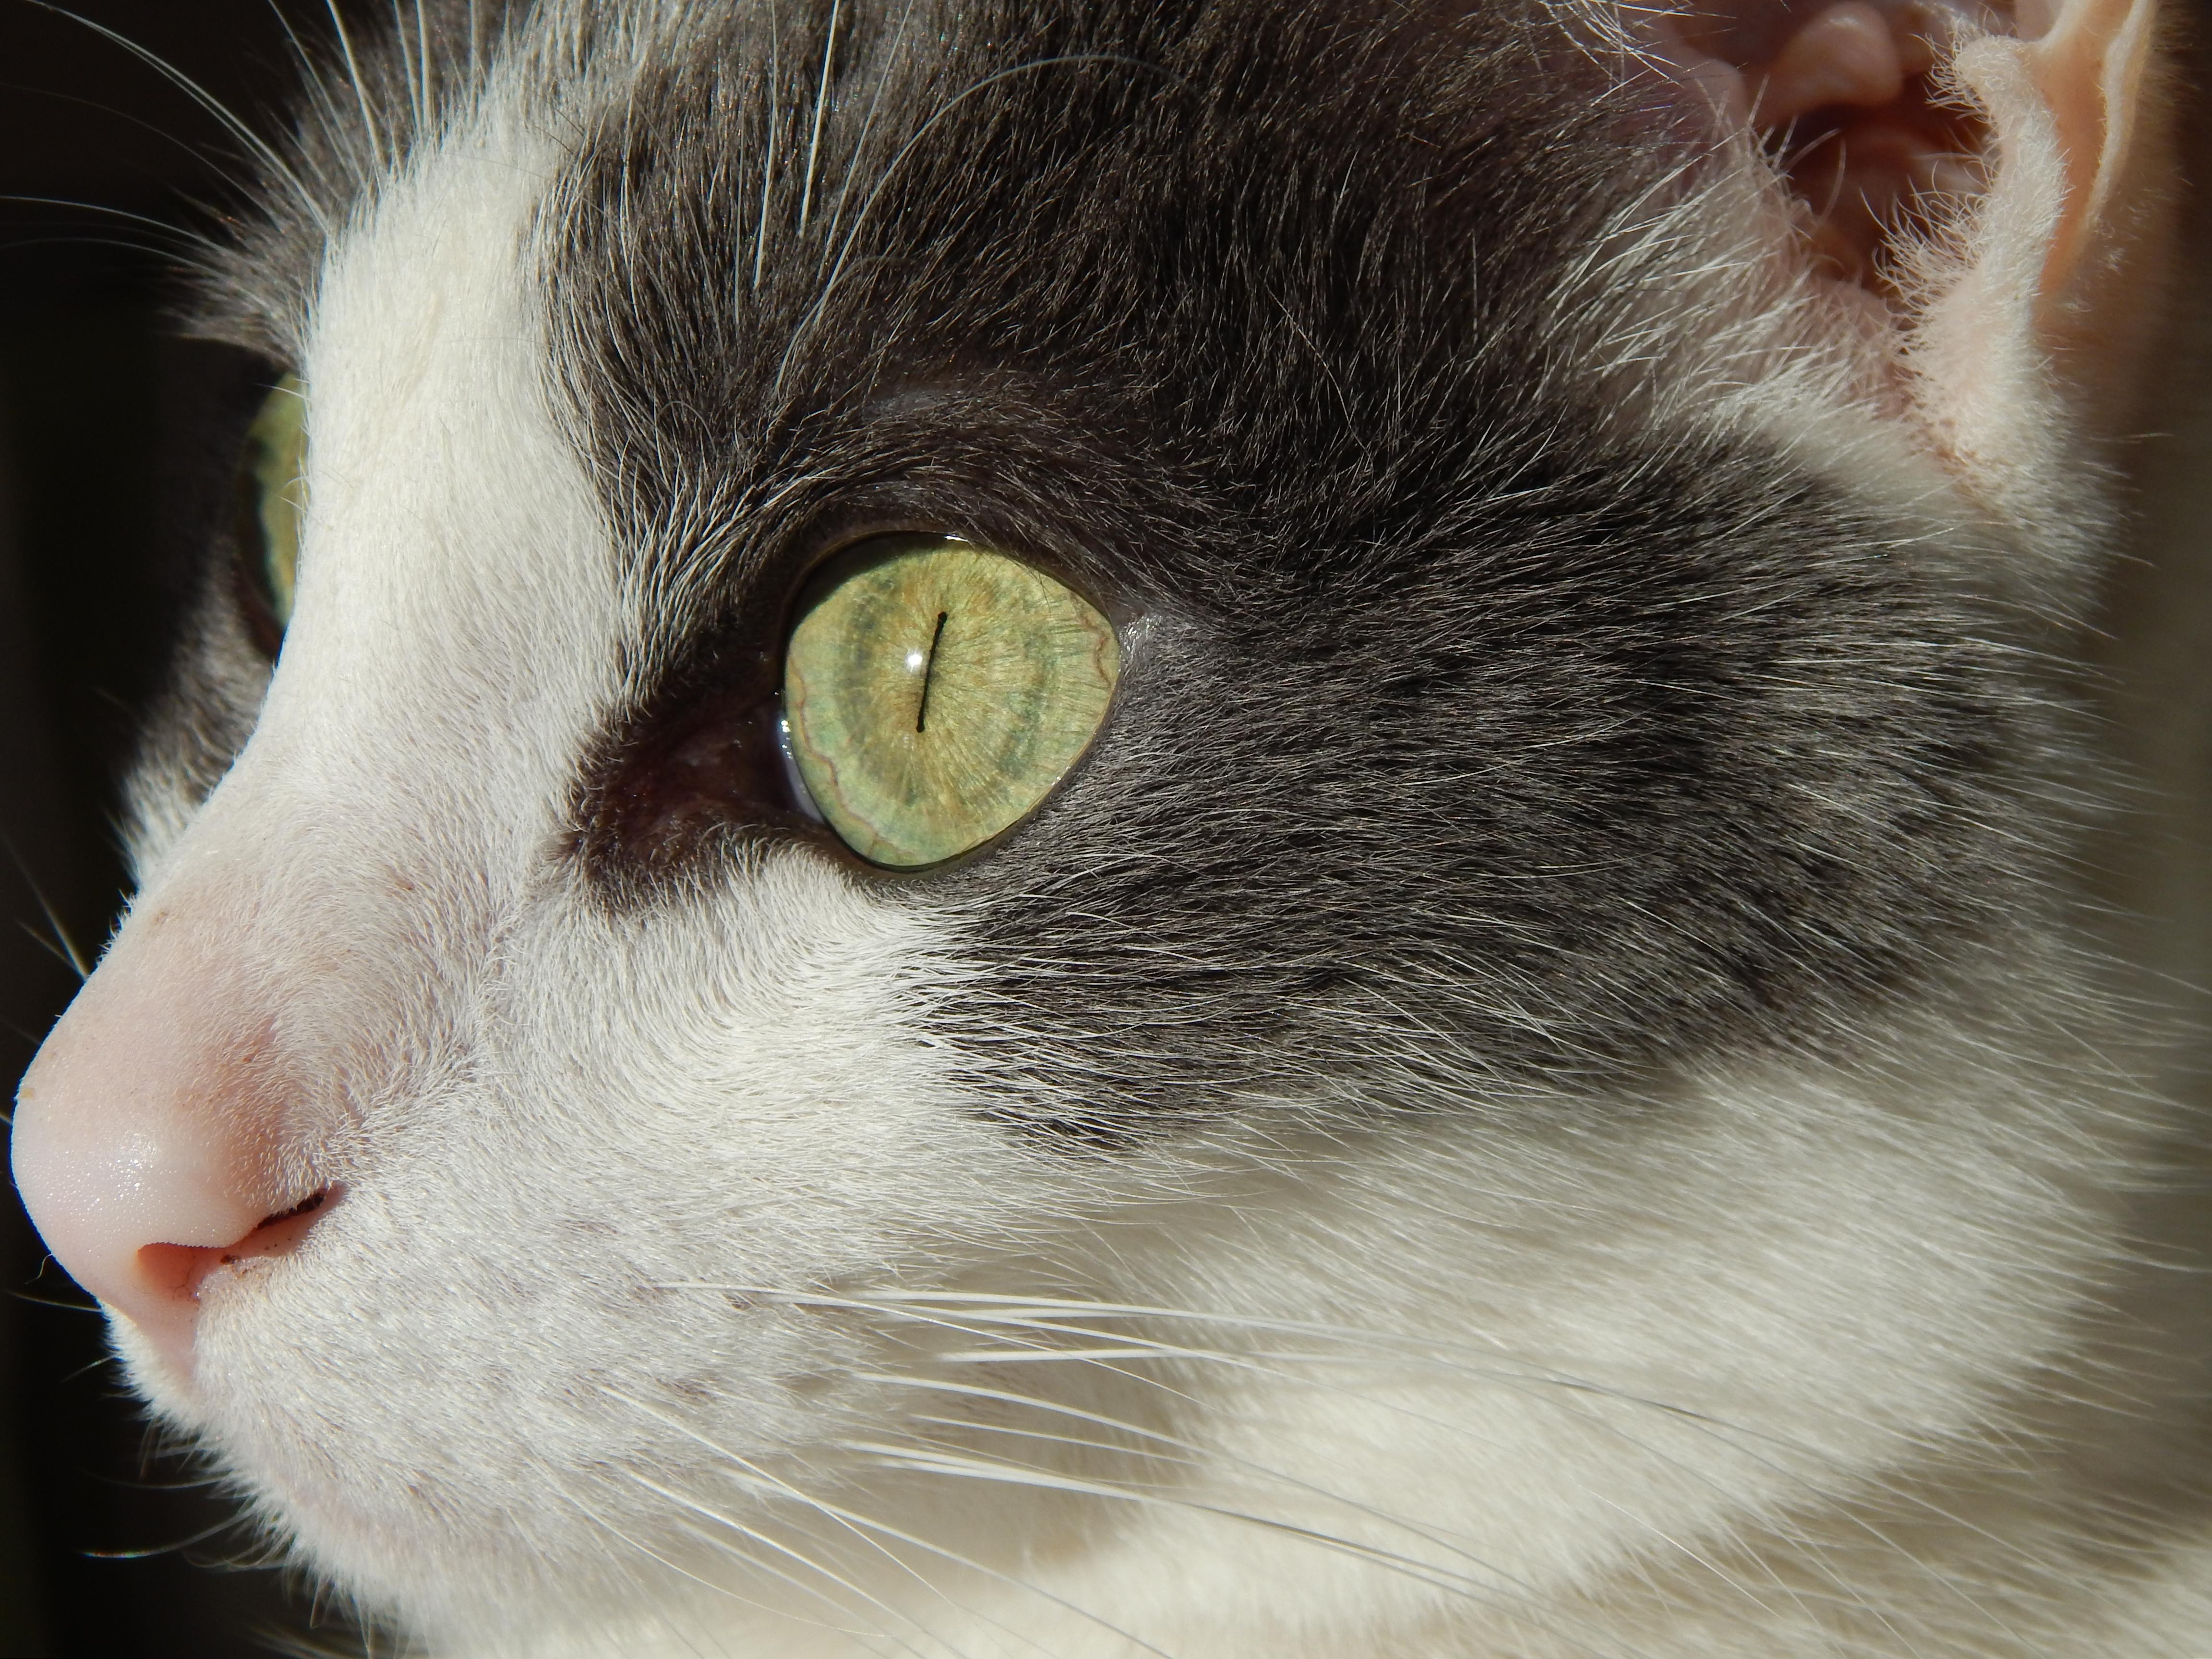 Cat closeup, Cat, Closeup, Feline, Fur, HQ Photo